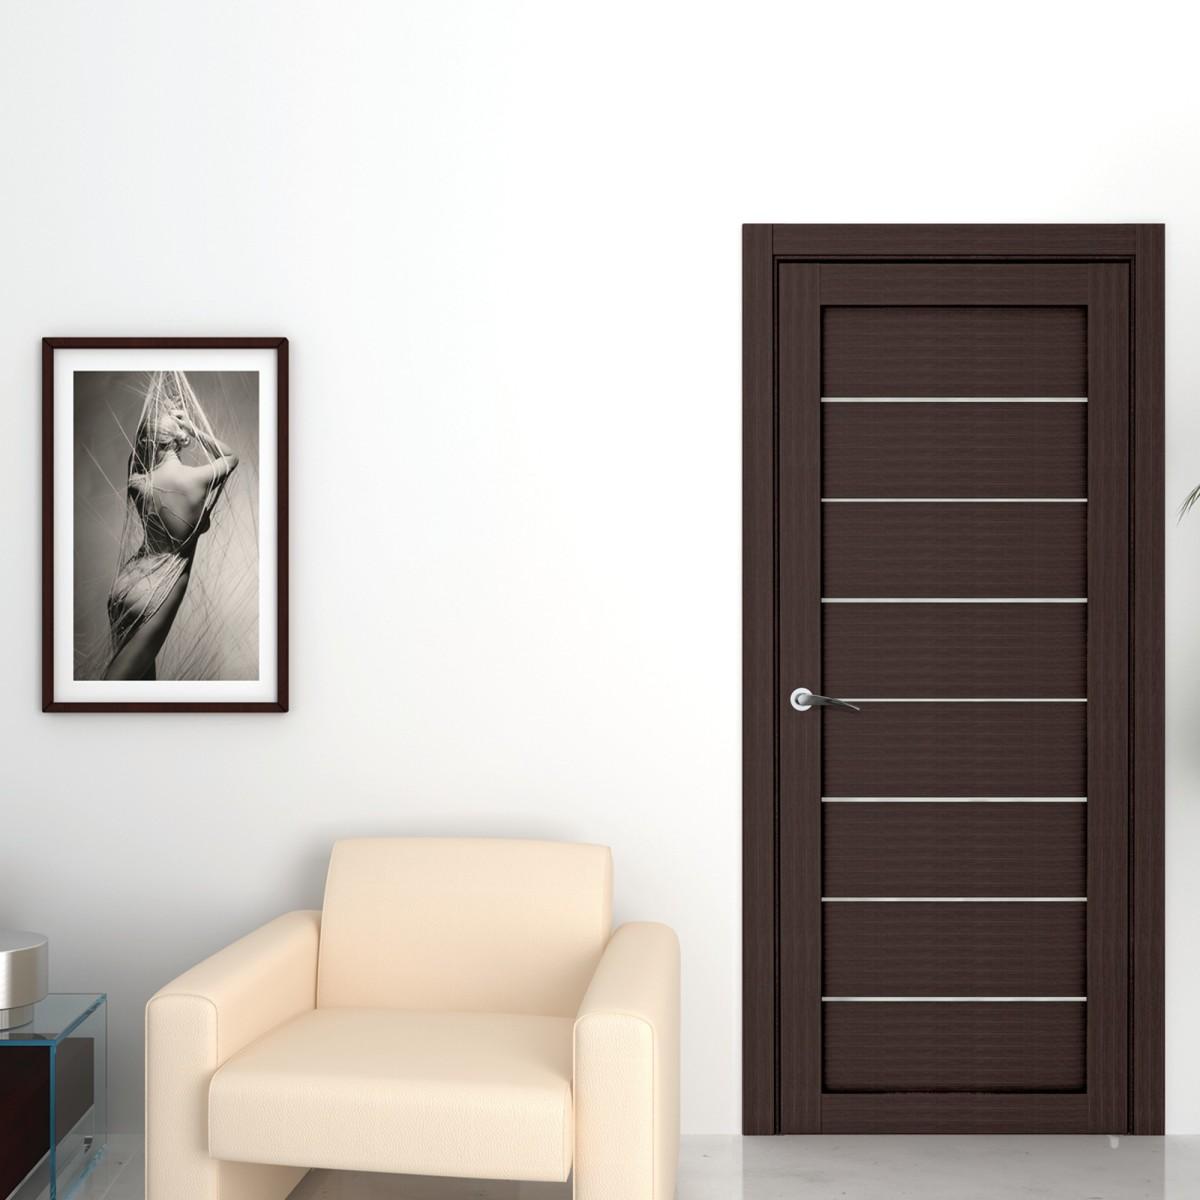 Дверь Межкомнатная Глухая Сабрина 60x200 Ламинация Цвет Мокко С Фурнитурой